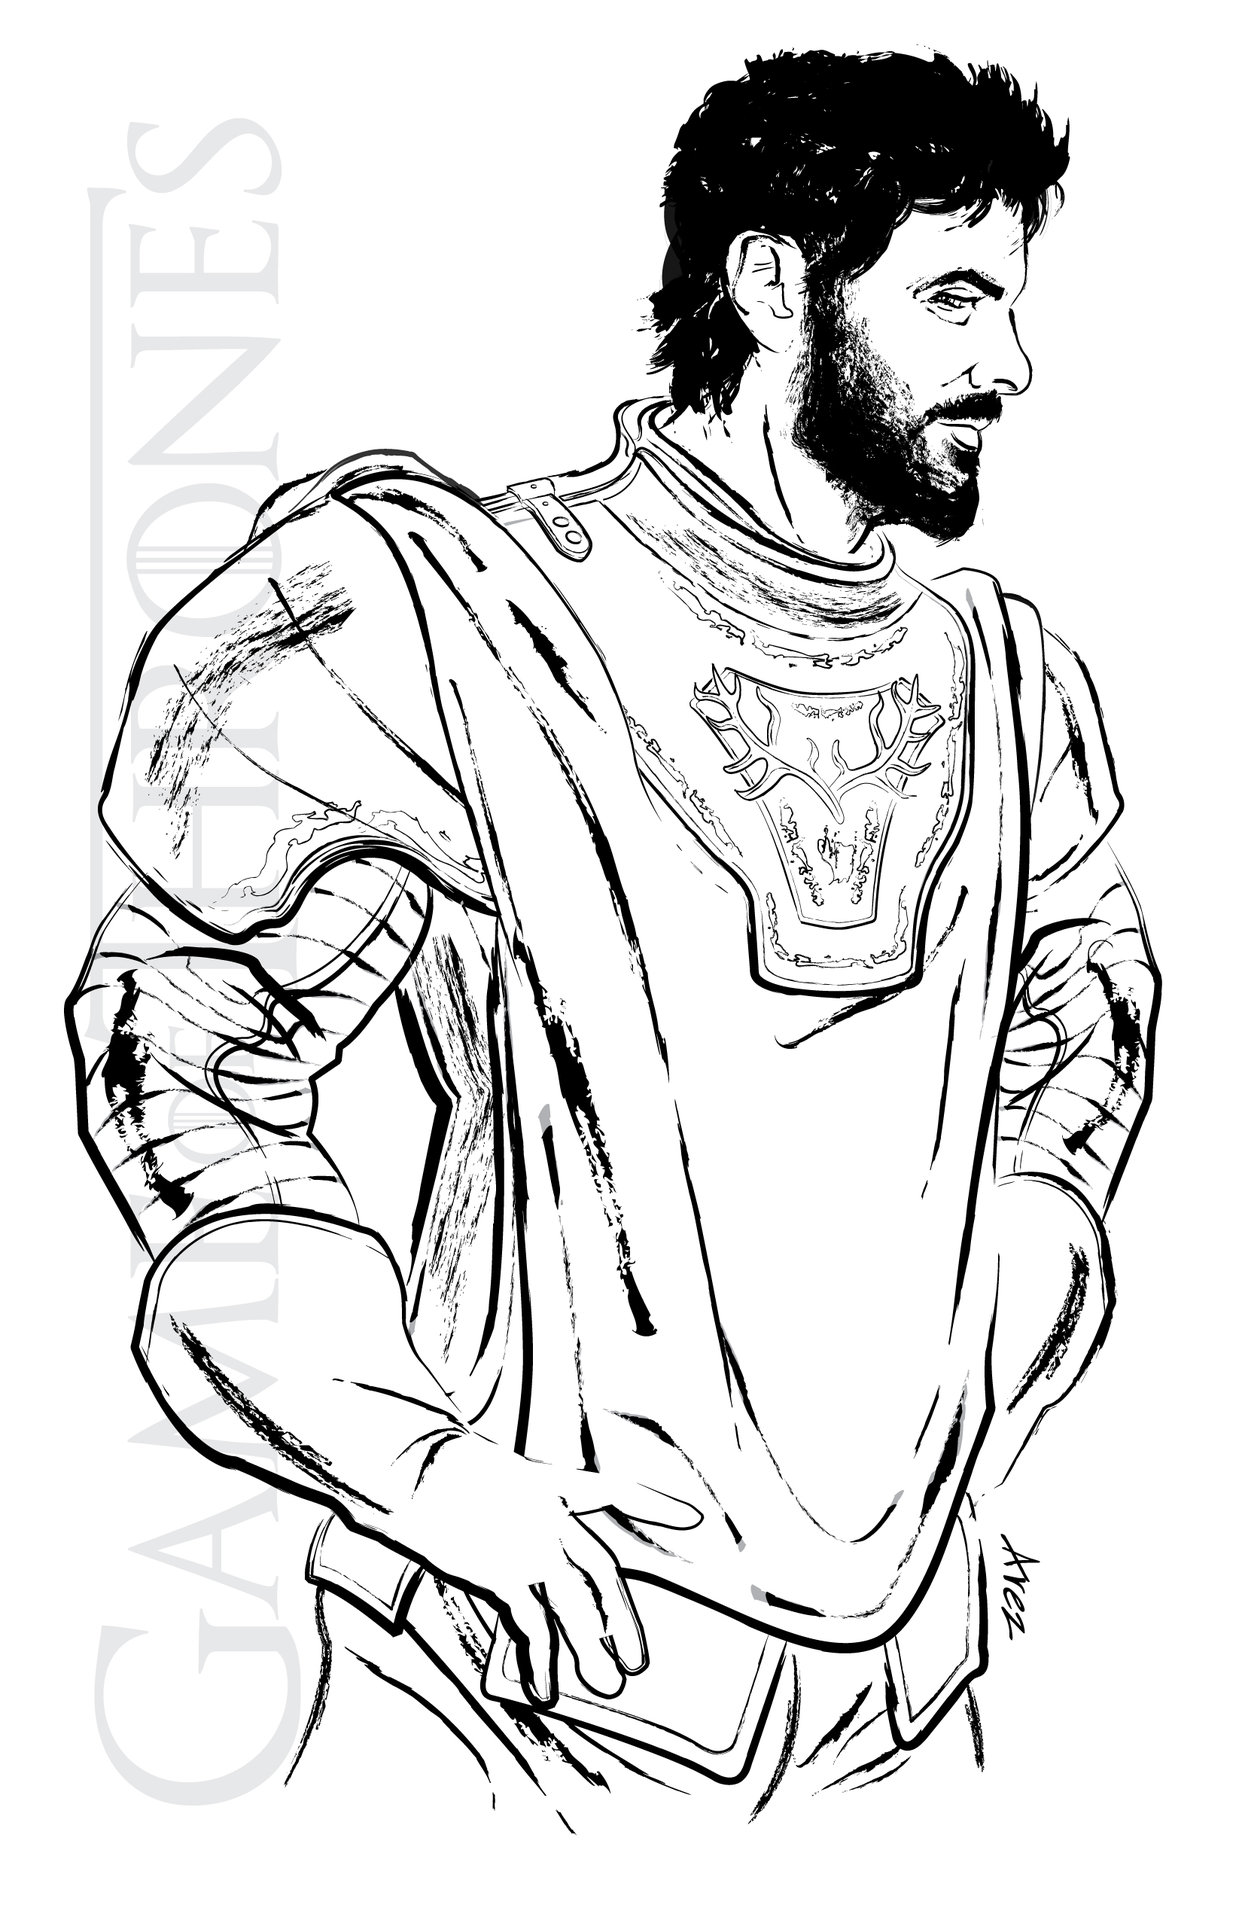 ArtStation - Renly Baratheon - The King in Highgarden, Lord